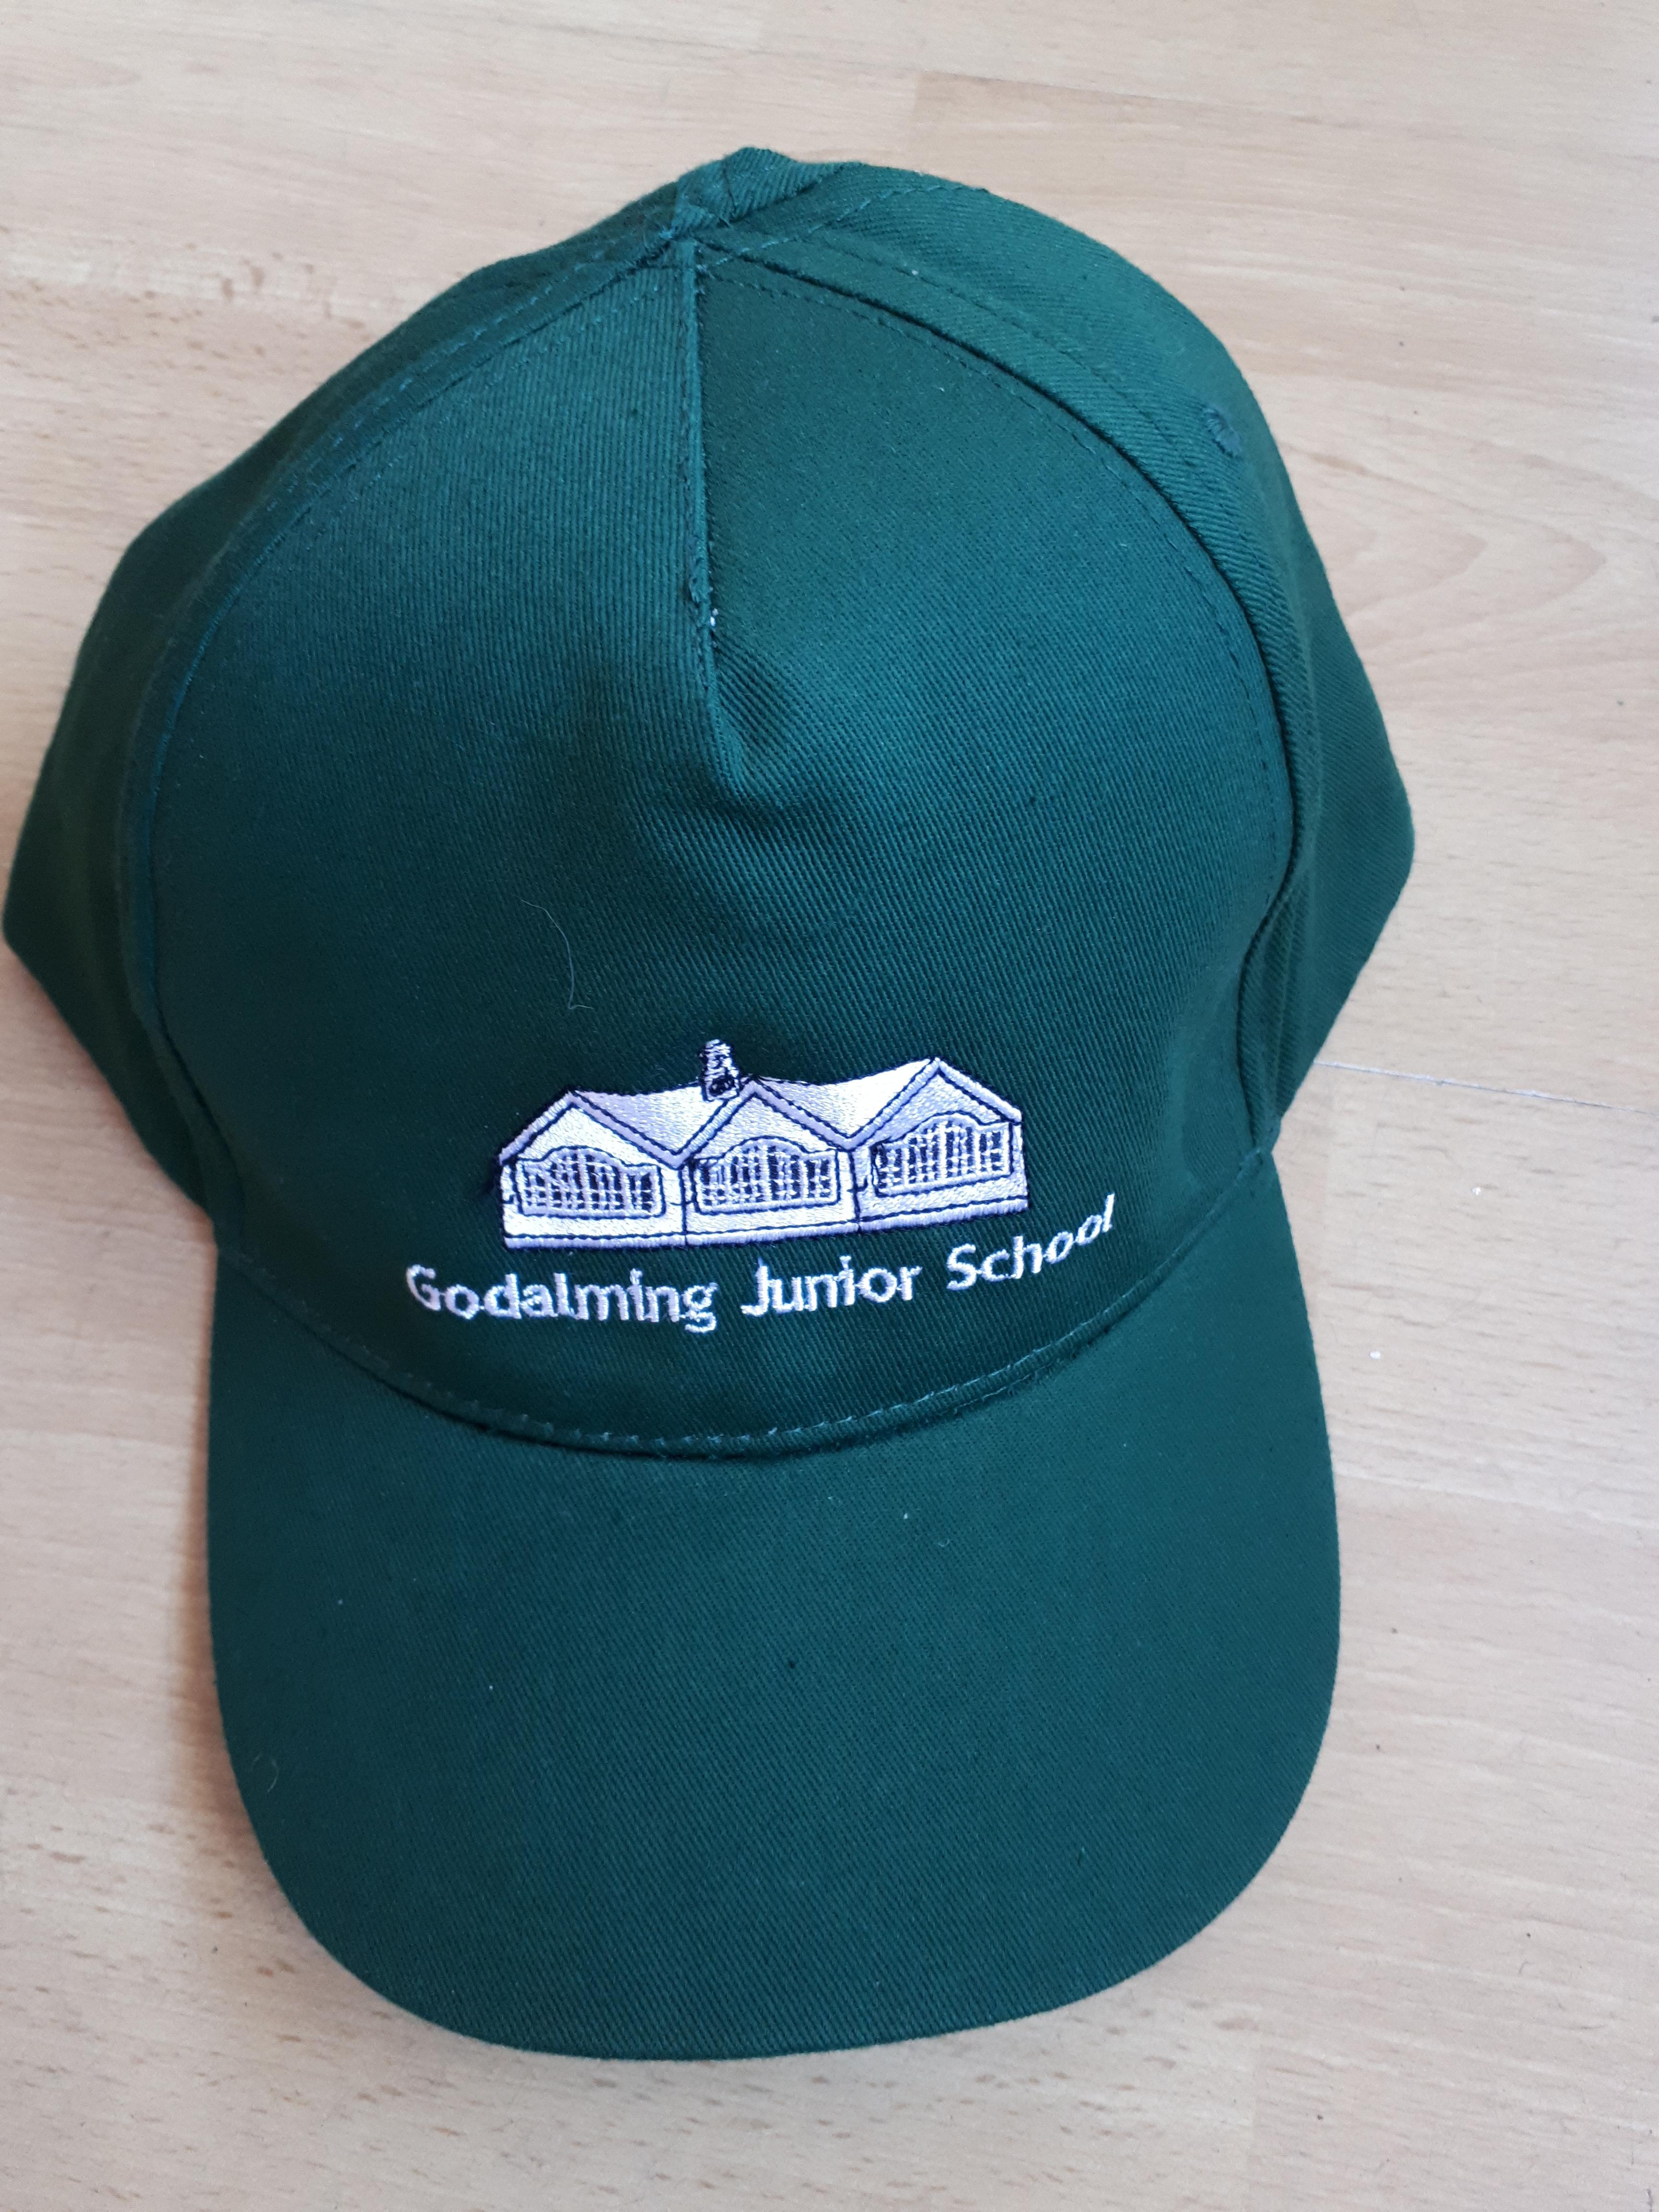 Godalming Cap